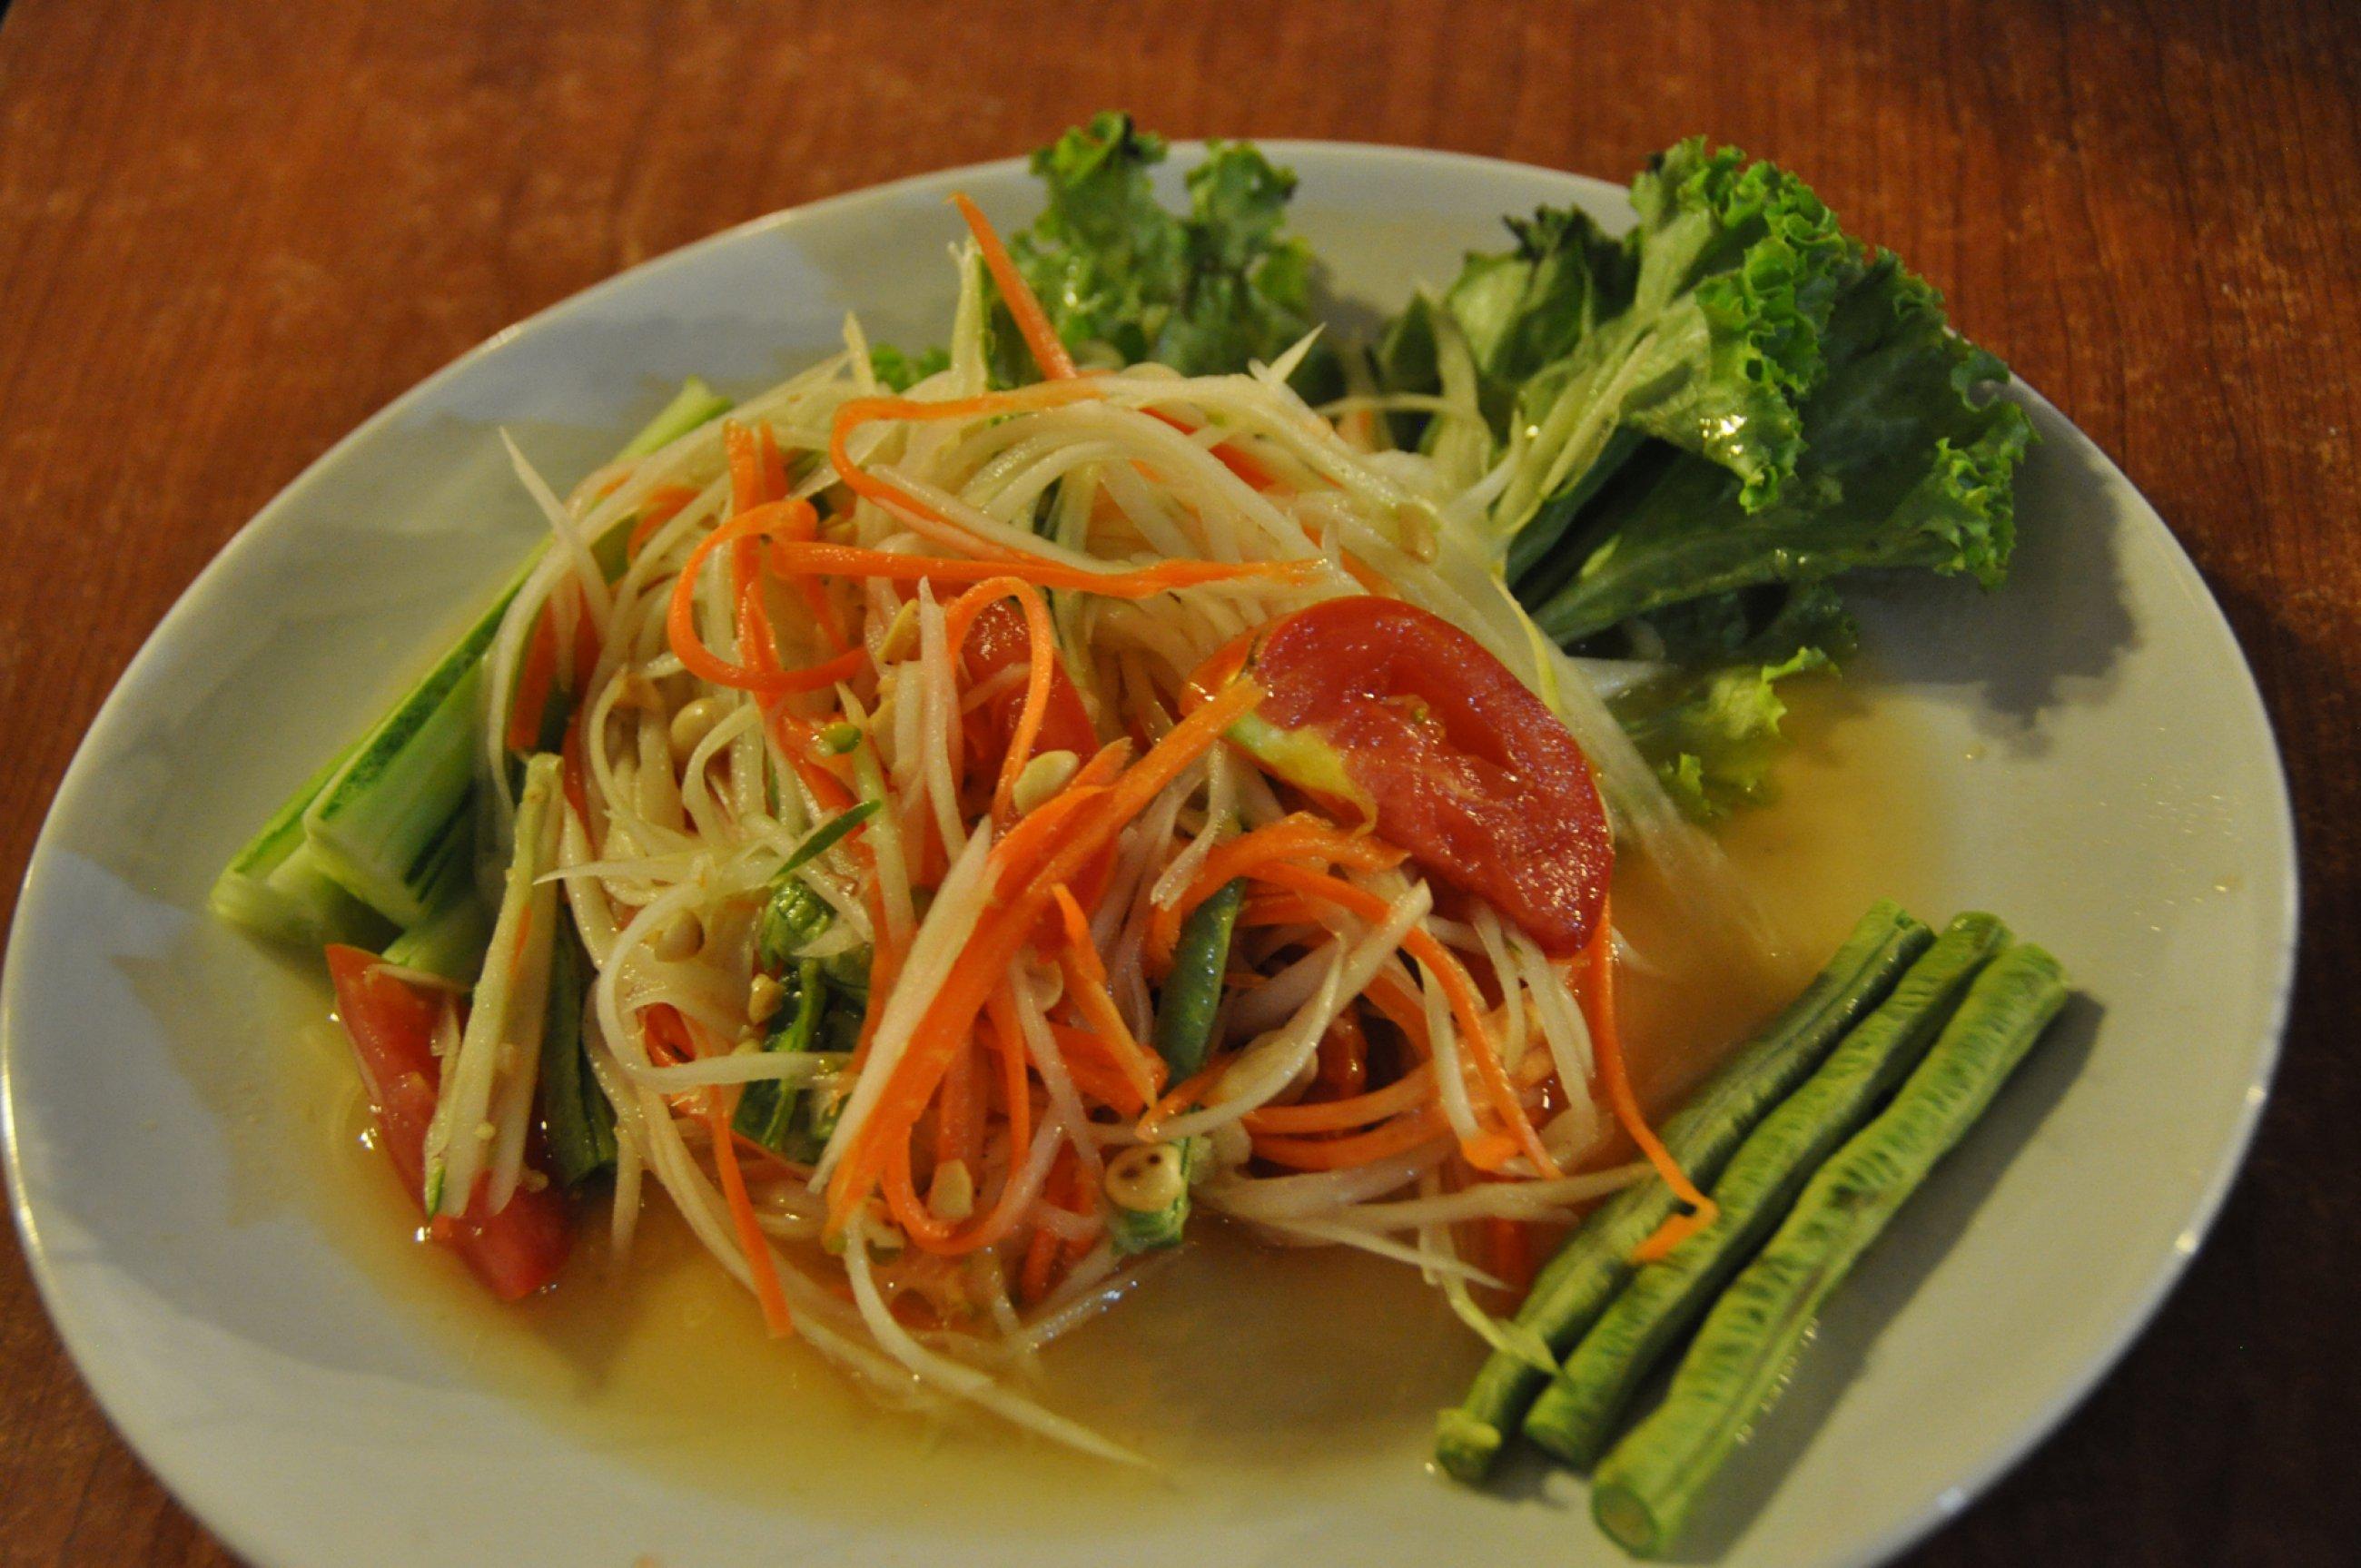 https://bubo.sk/uploads/galleries/5064/food-tomas-kubus-papajovy-salat-som-tam-patri-k-najlepsim-thajskym-salatom.jpg